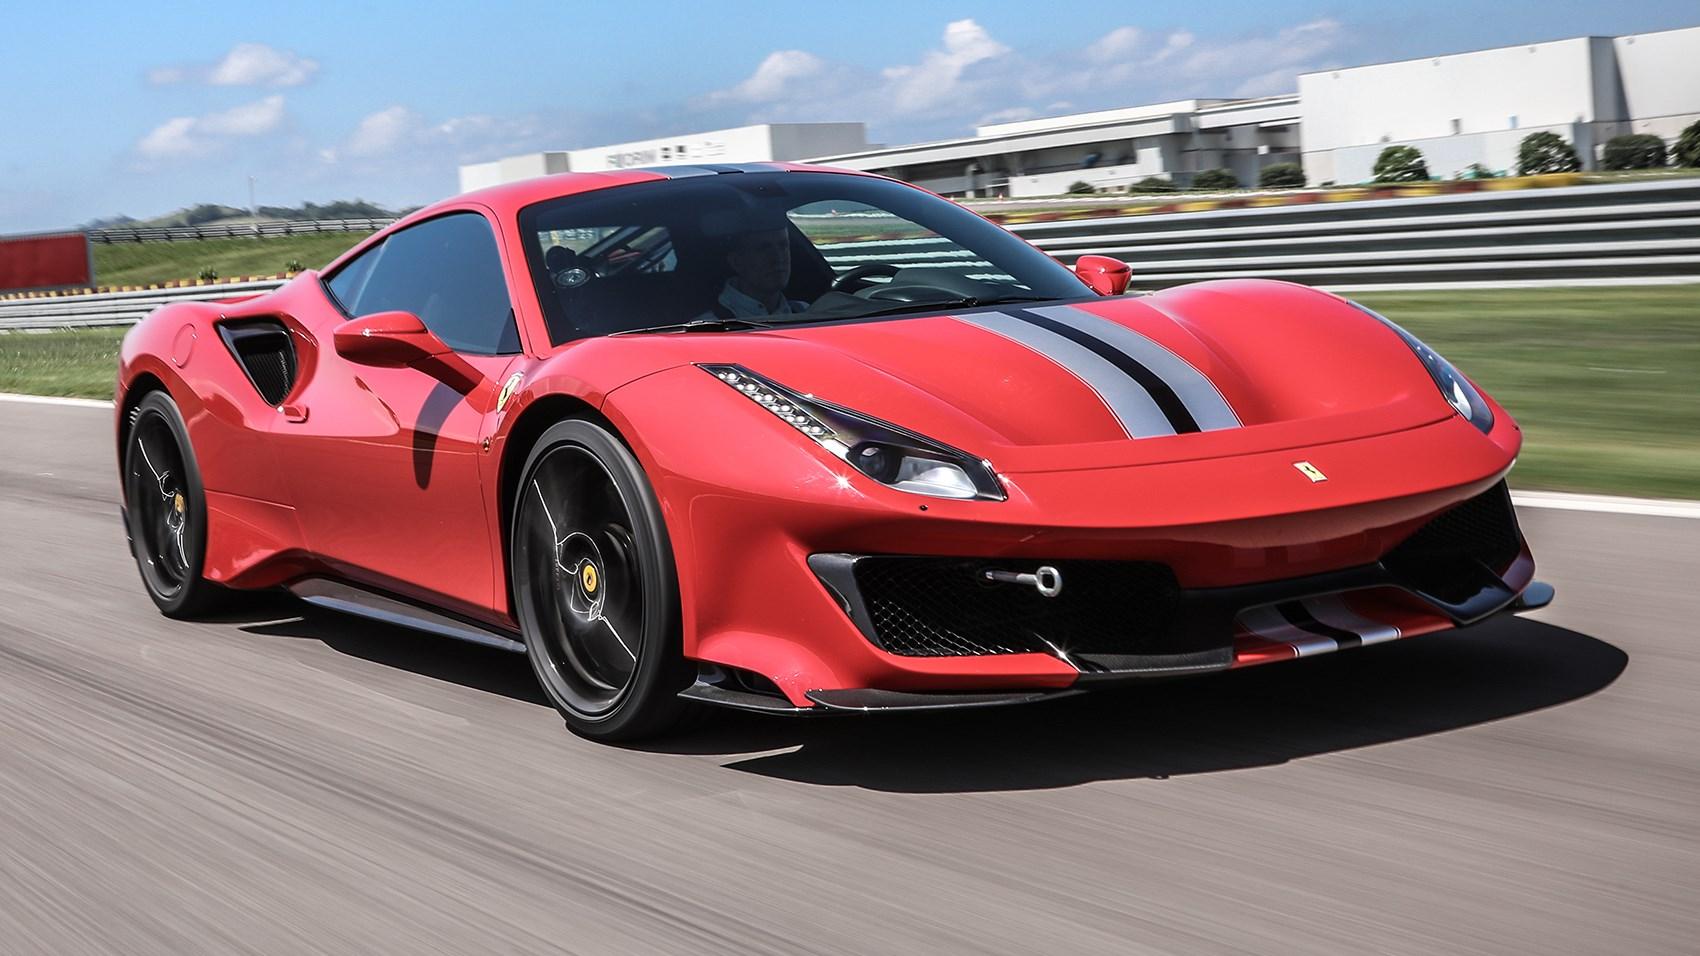 Ferrari 488 Pista (2018) Review